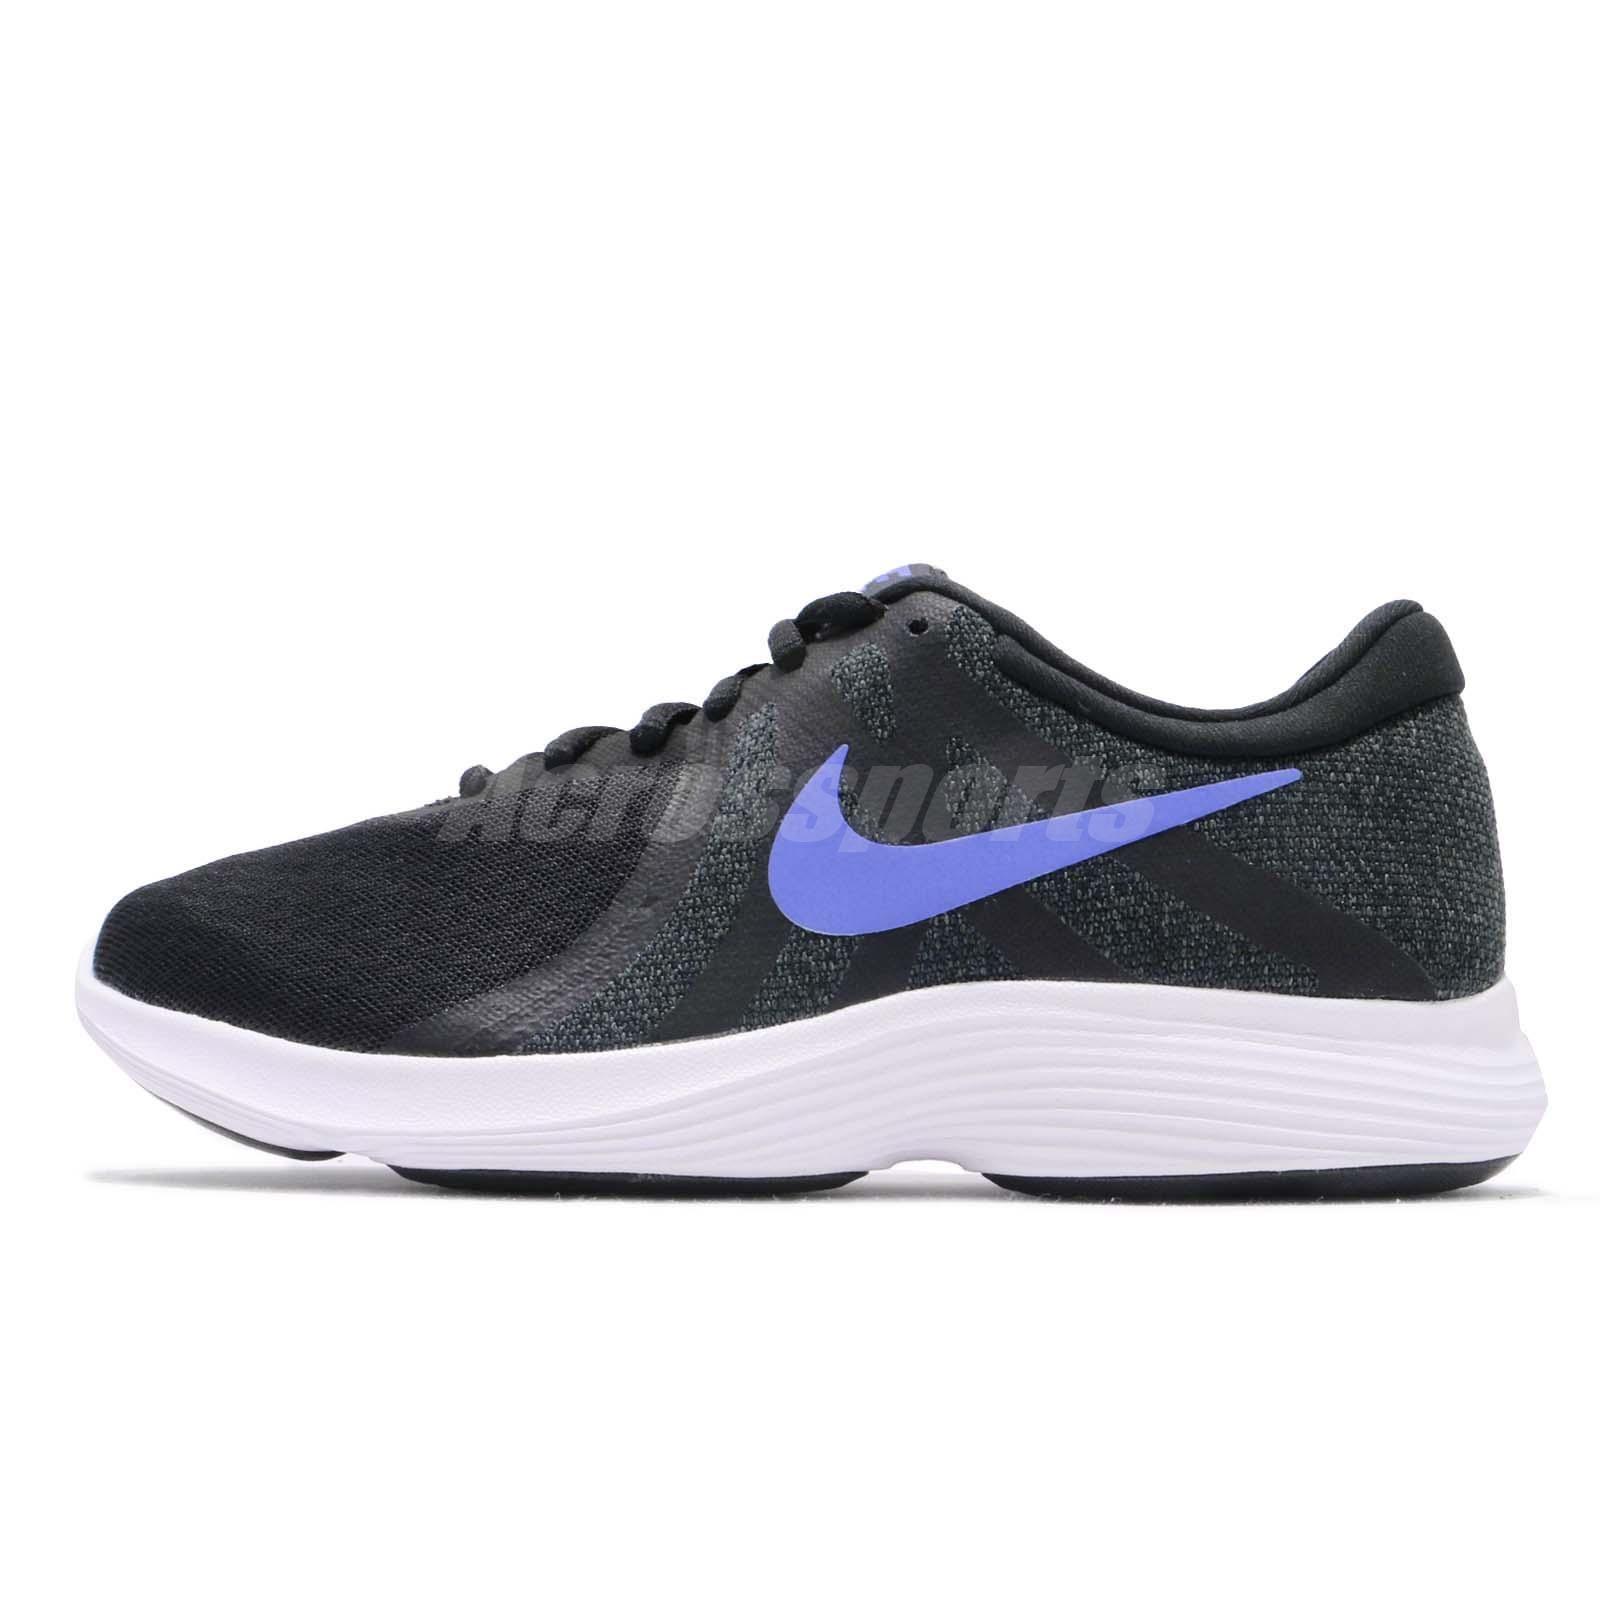 b12423ef621c Nike Wmns Revolution 4 Black Sapphire White Women Running Shoes 908999-014